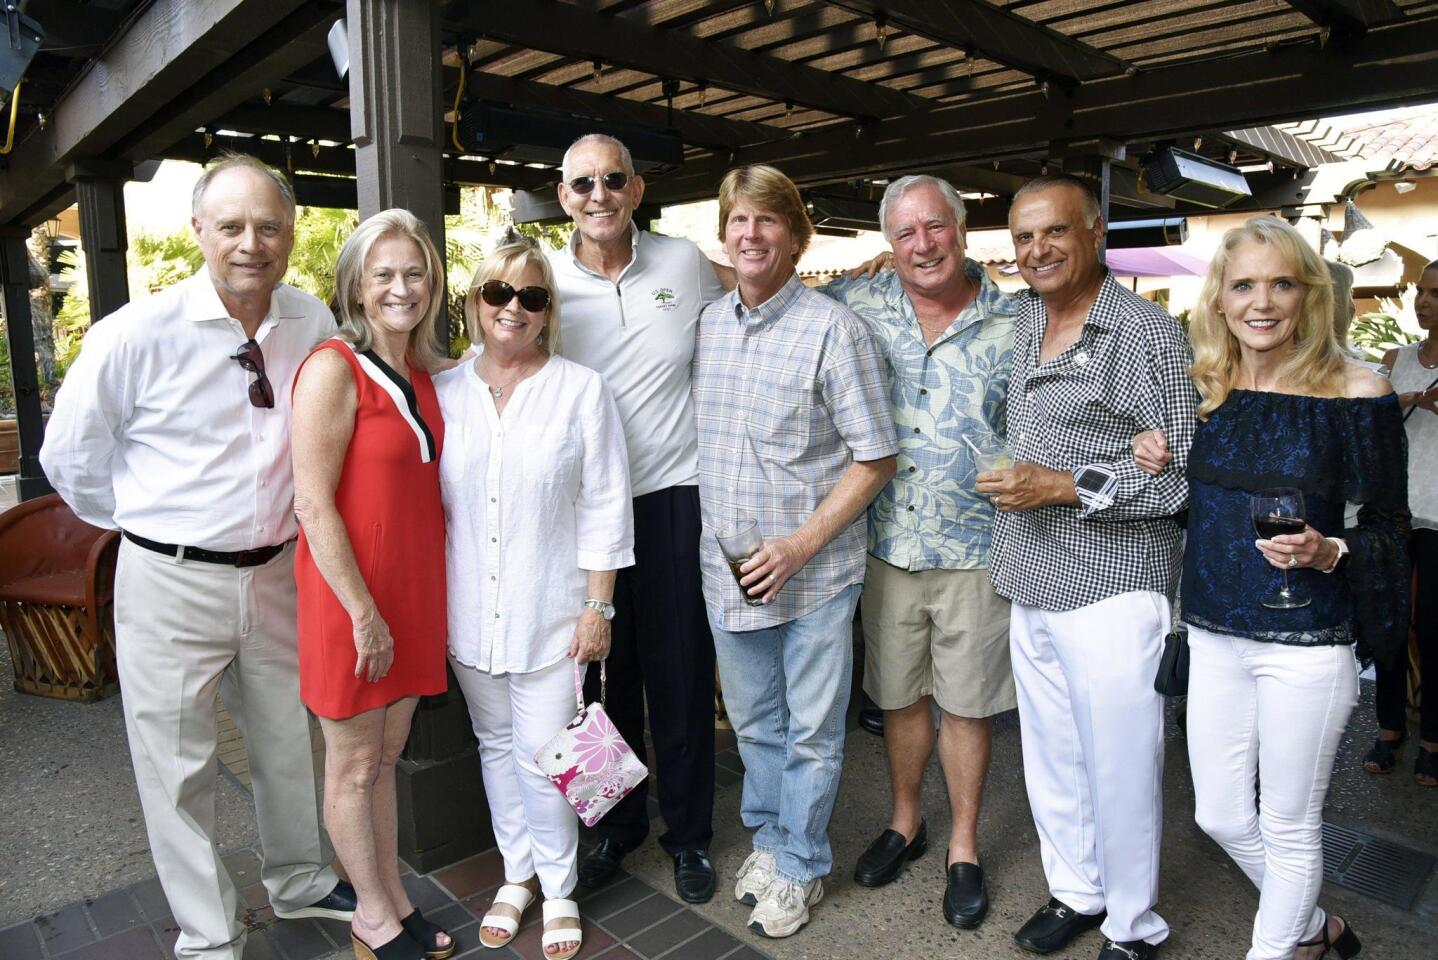 Greg Jackey, Nicky Taylor, Beverly Robinson, Mike Taylor, Chuck Badger, Alan Balfour, RSF Rotary President Elie Feghali and Lori Feghali